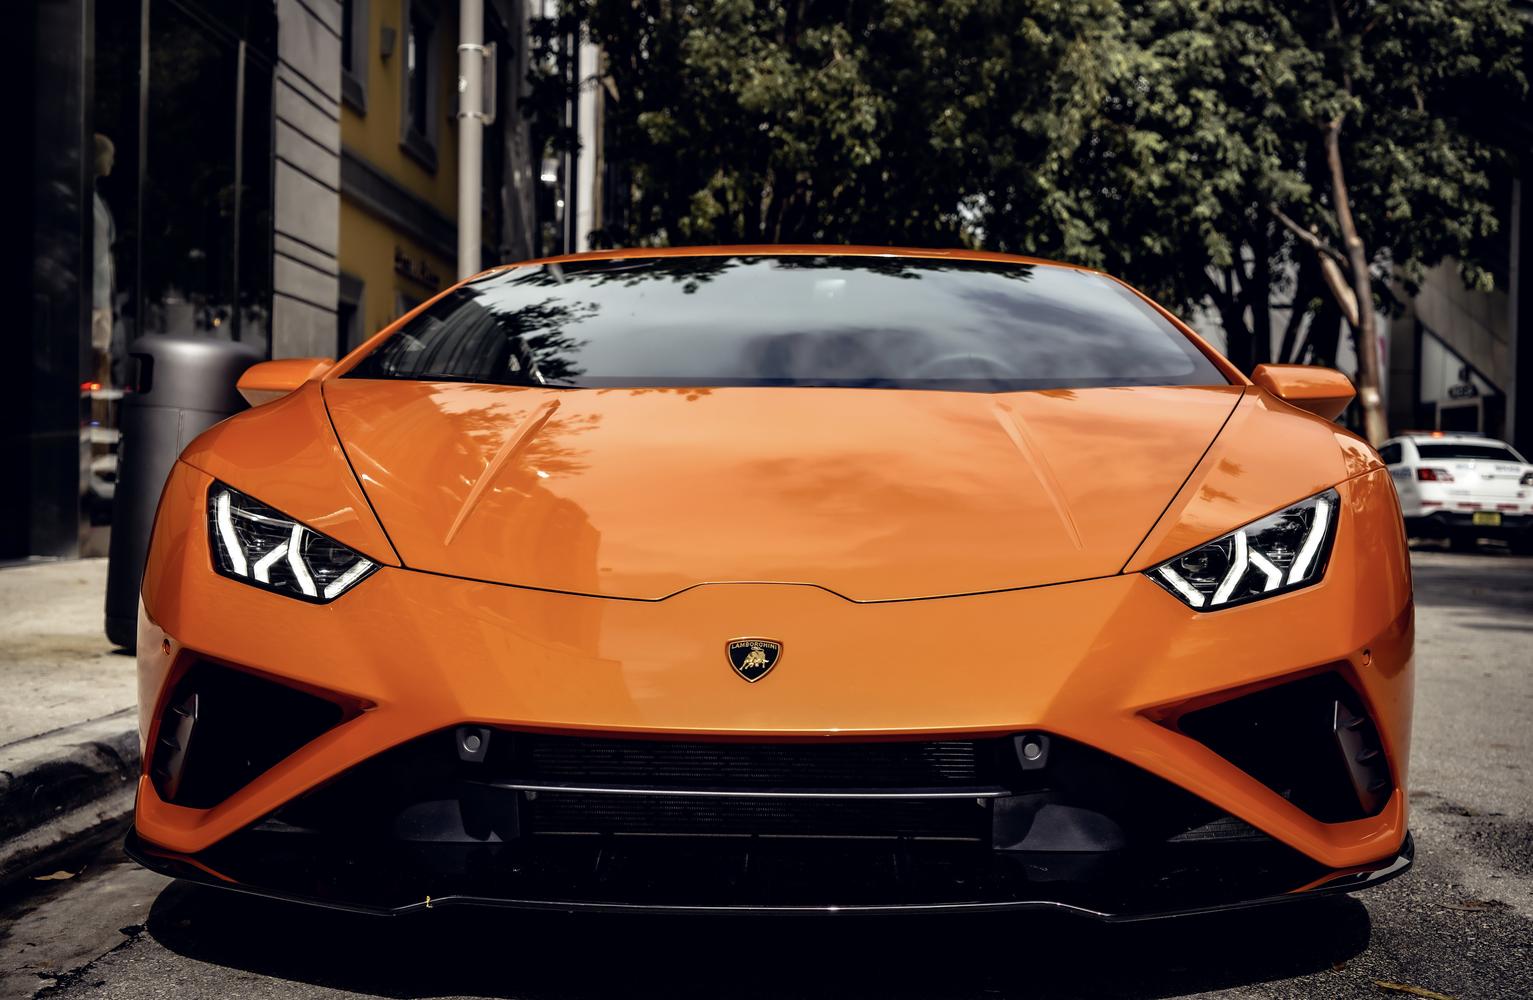 Image #0 of our  Lamborghini Huracan EVO Orange Coupe    In Miami Fort Lauderdale Palm Beach South Florida